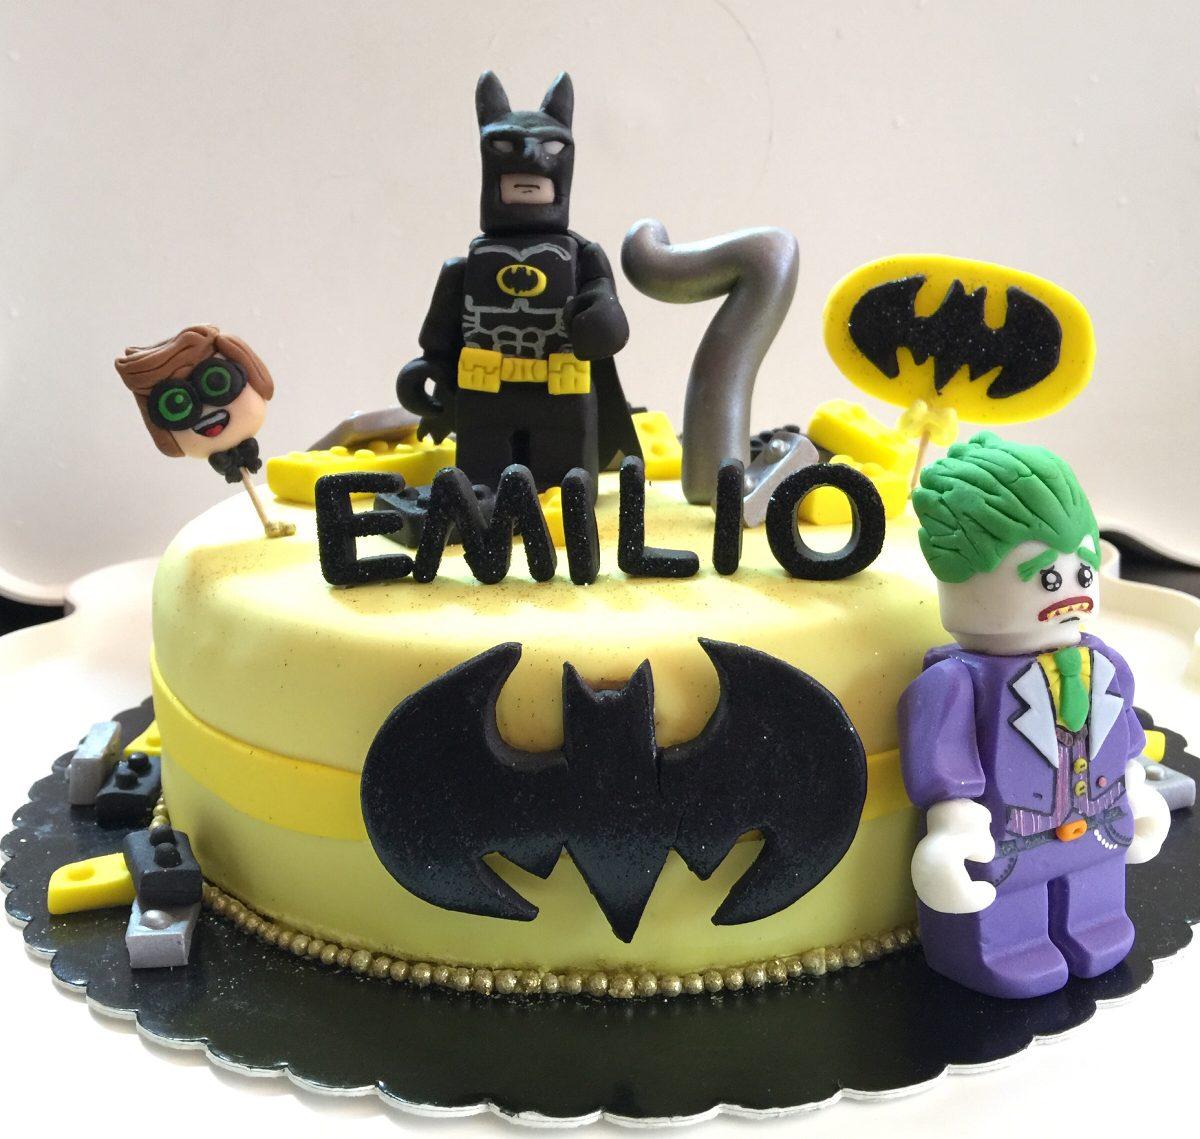 Pastel Decorado Con Fondant Lego Batman Cumplea 241 Os